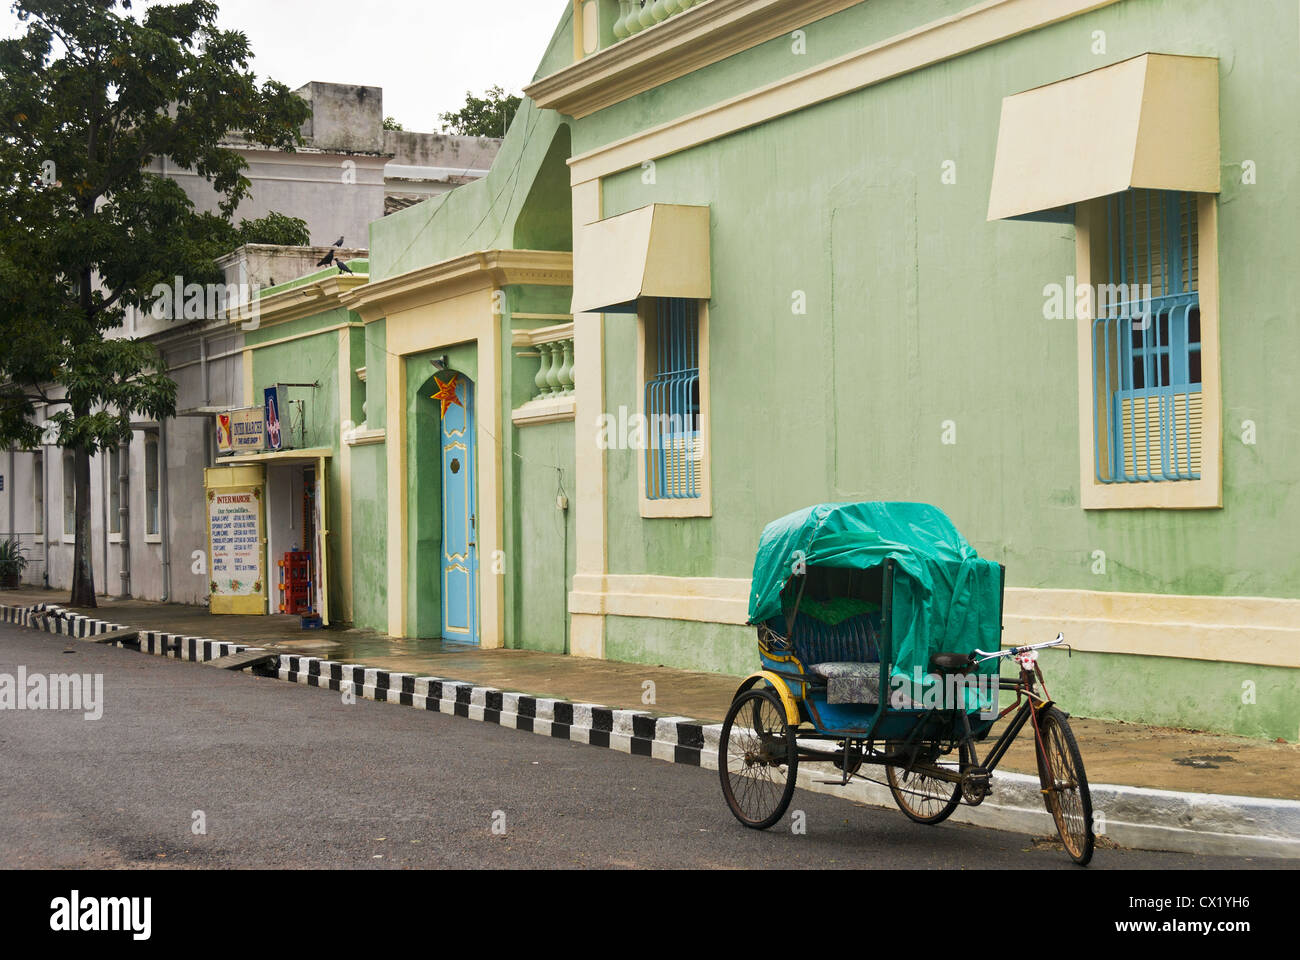 Elk201-4470 India, Tamil Nadu, Pondicherry, French Quarter, street scene with cycle rickshaw - Stock Image